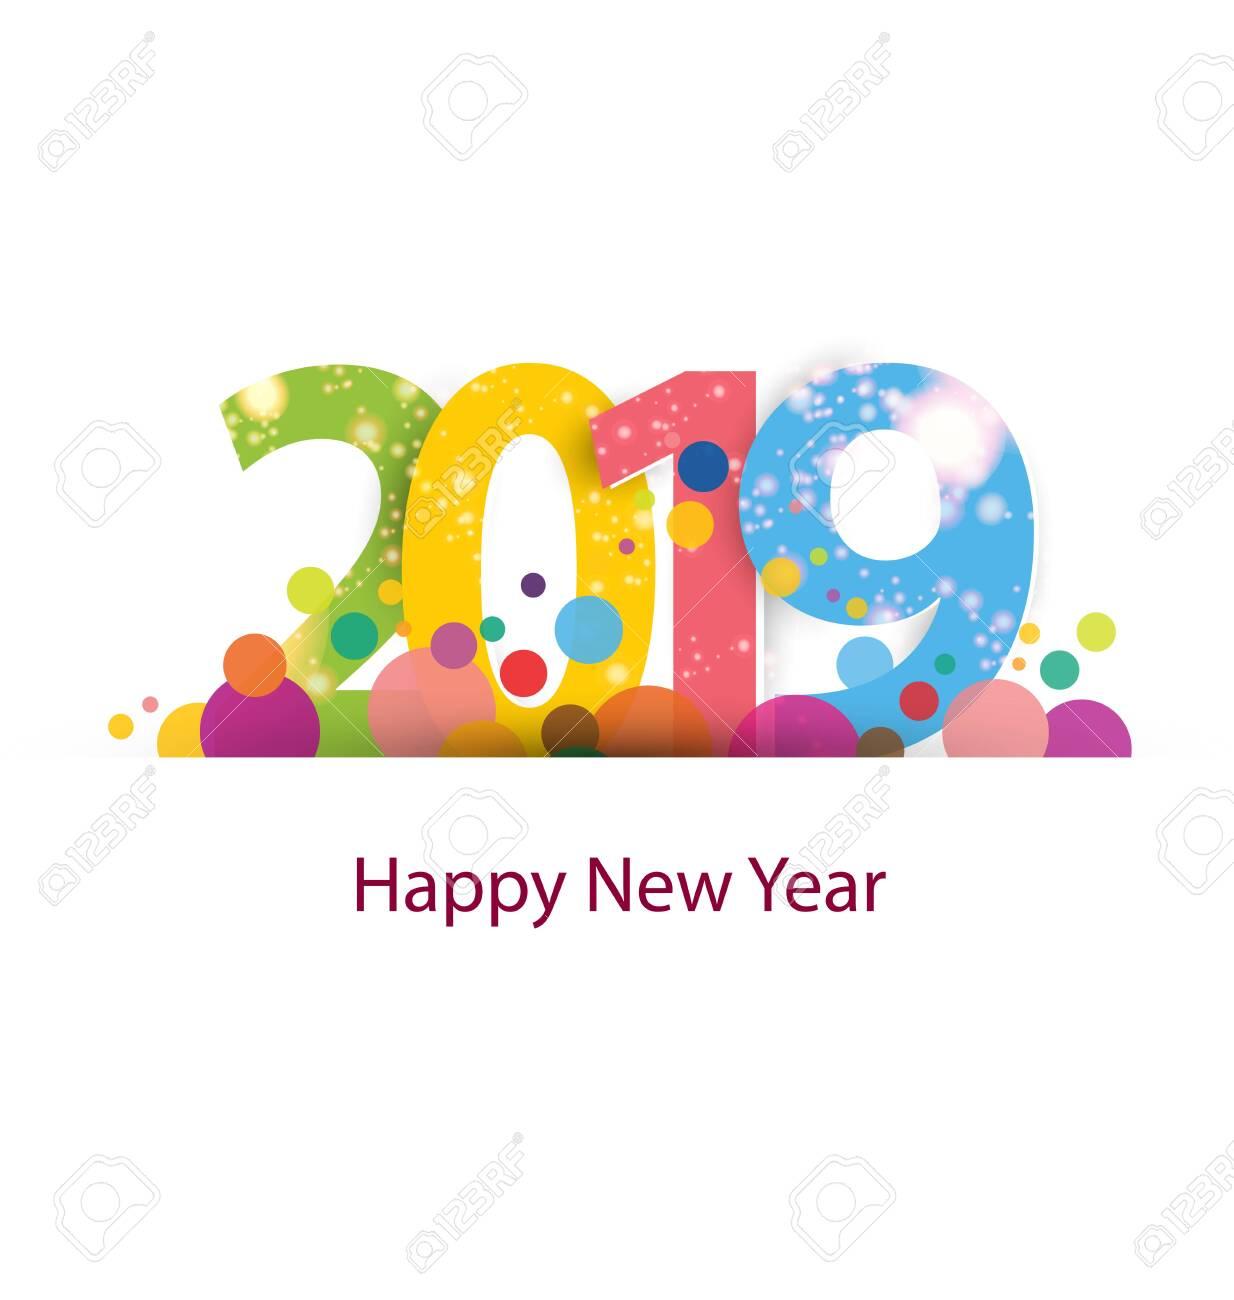 Happy new year 2019 - 130420964